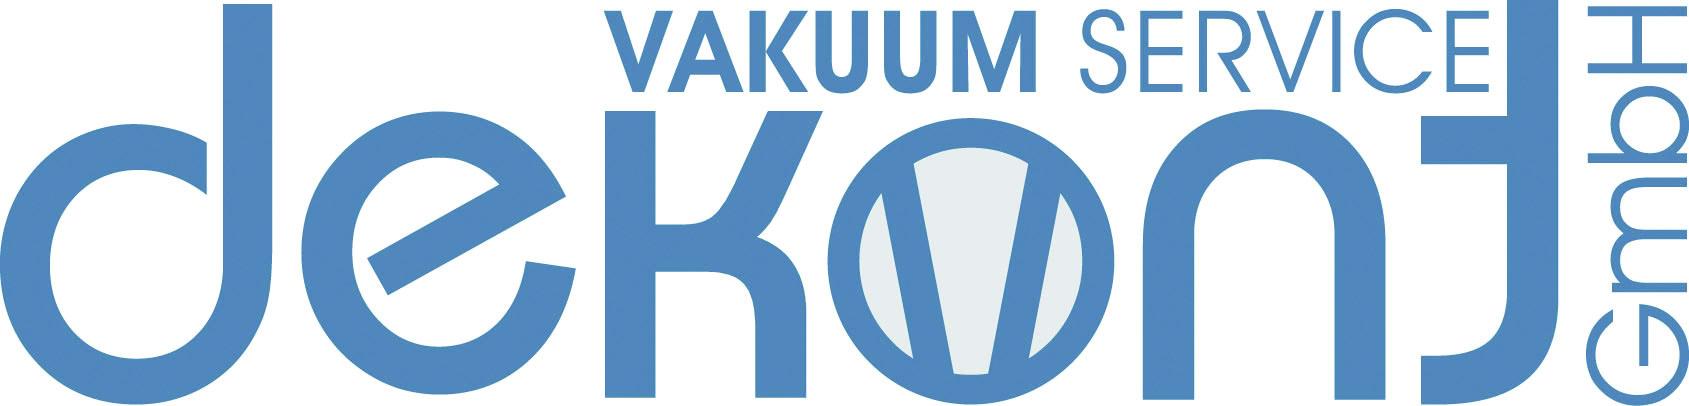 Dekont Vakuum SERVICE GmbH Logo